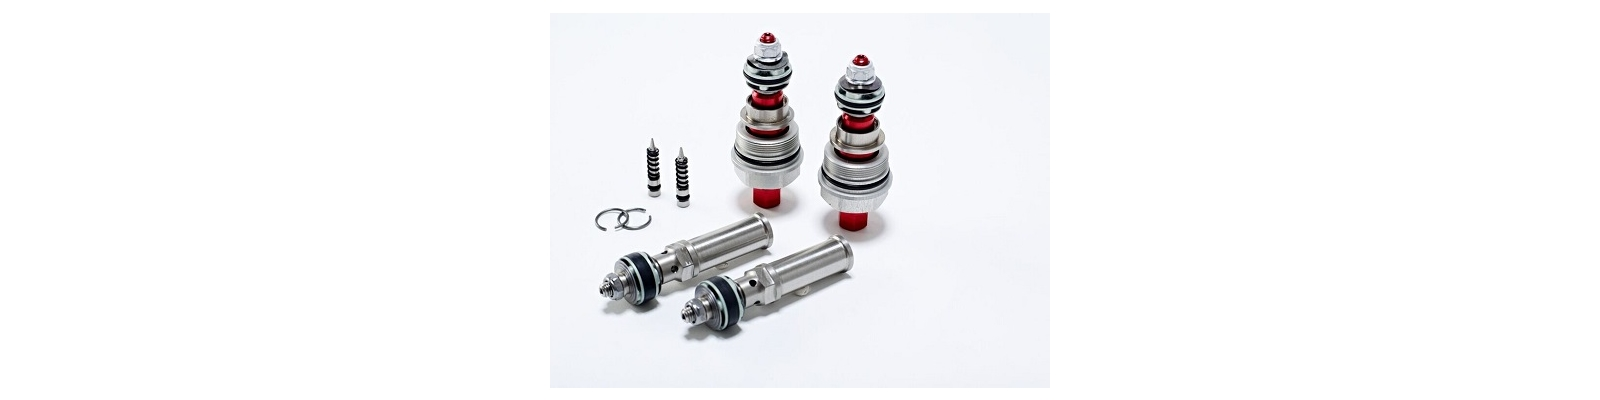 KTM Fork Piston Kits